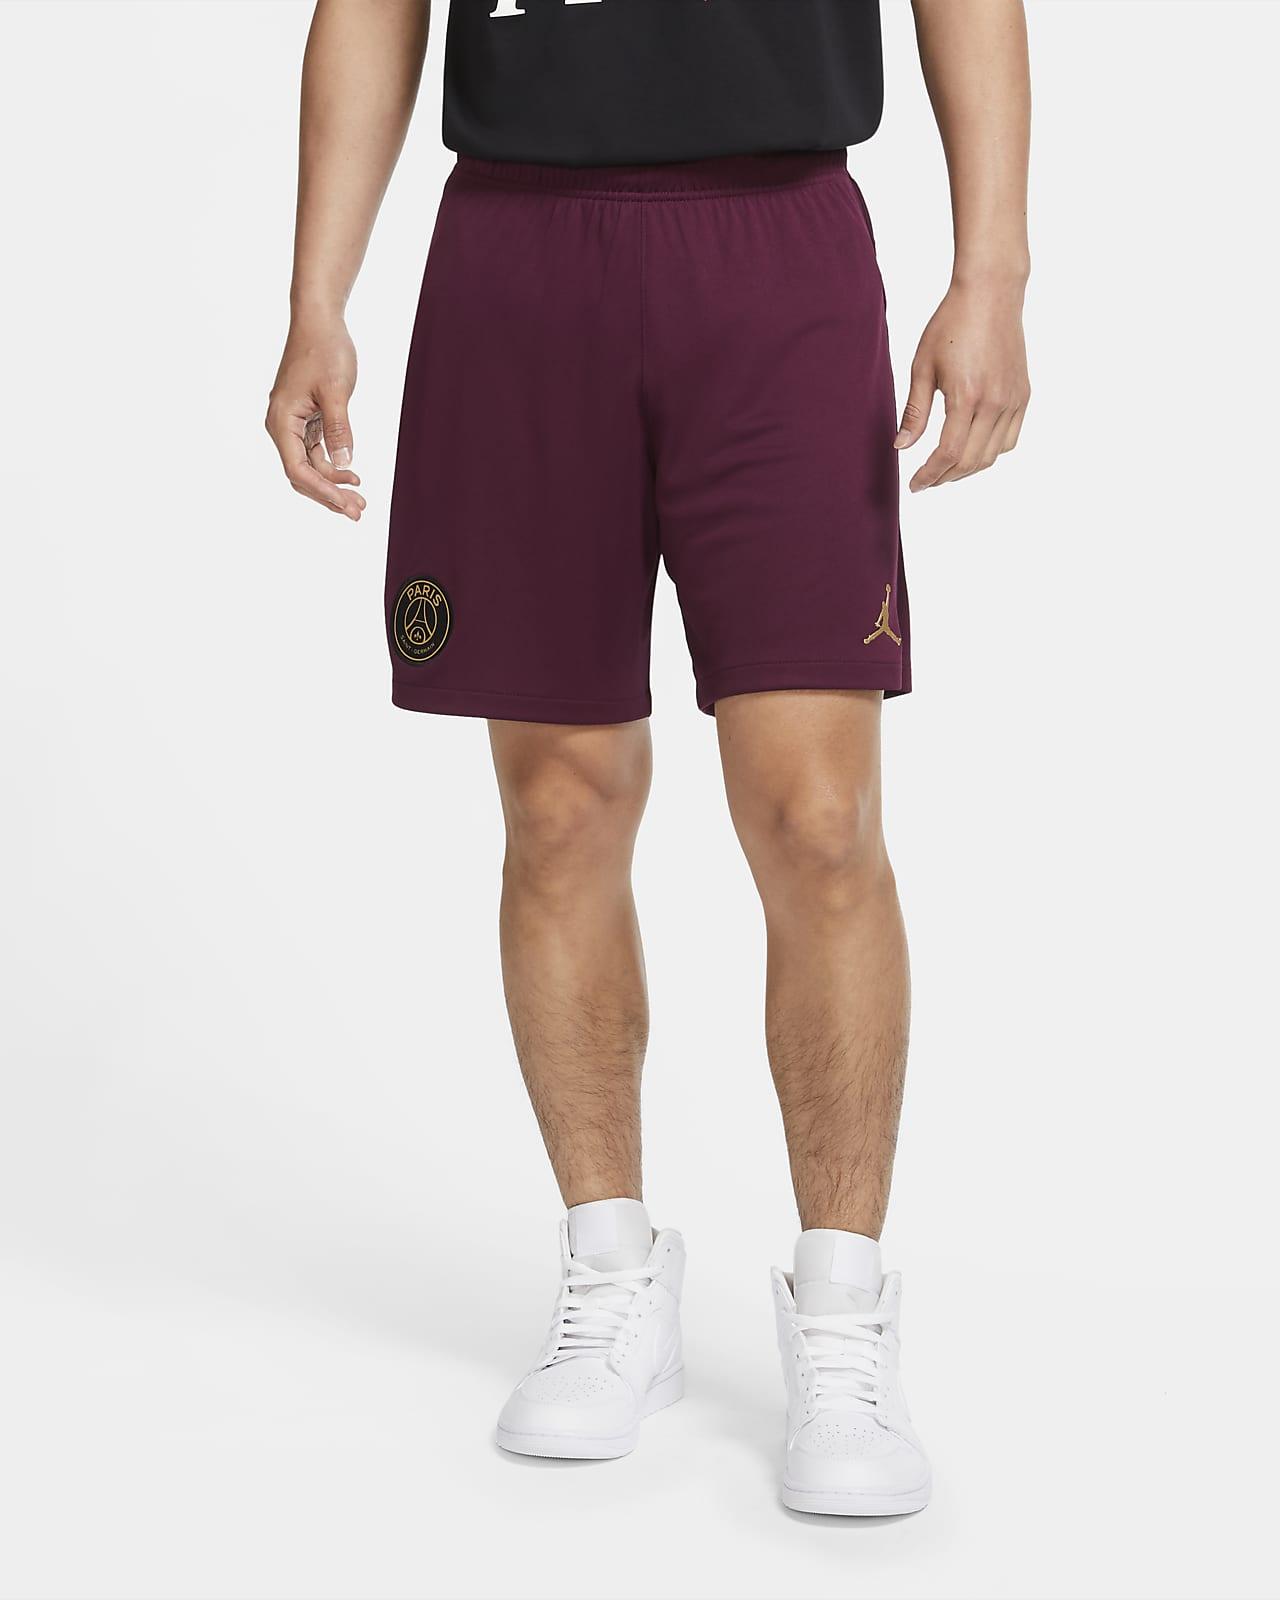 Paris Saint-Germain 2020/21 Stadium Third Men's Football Shorts